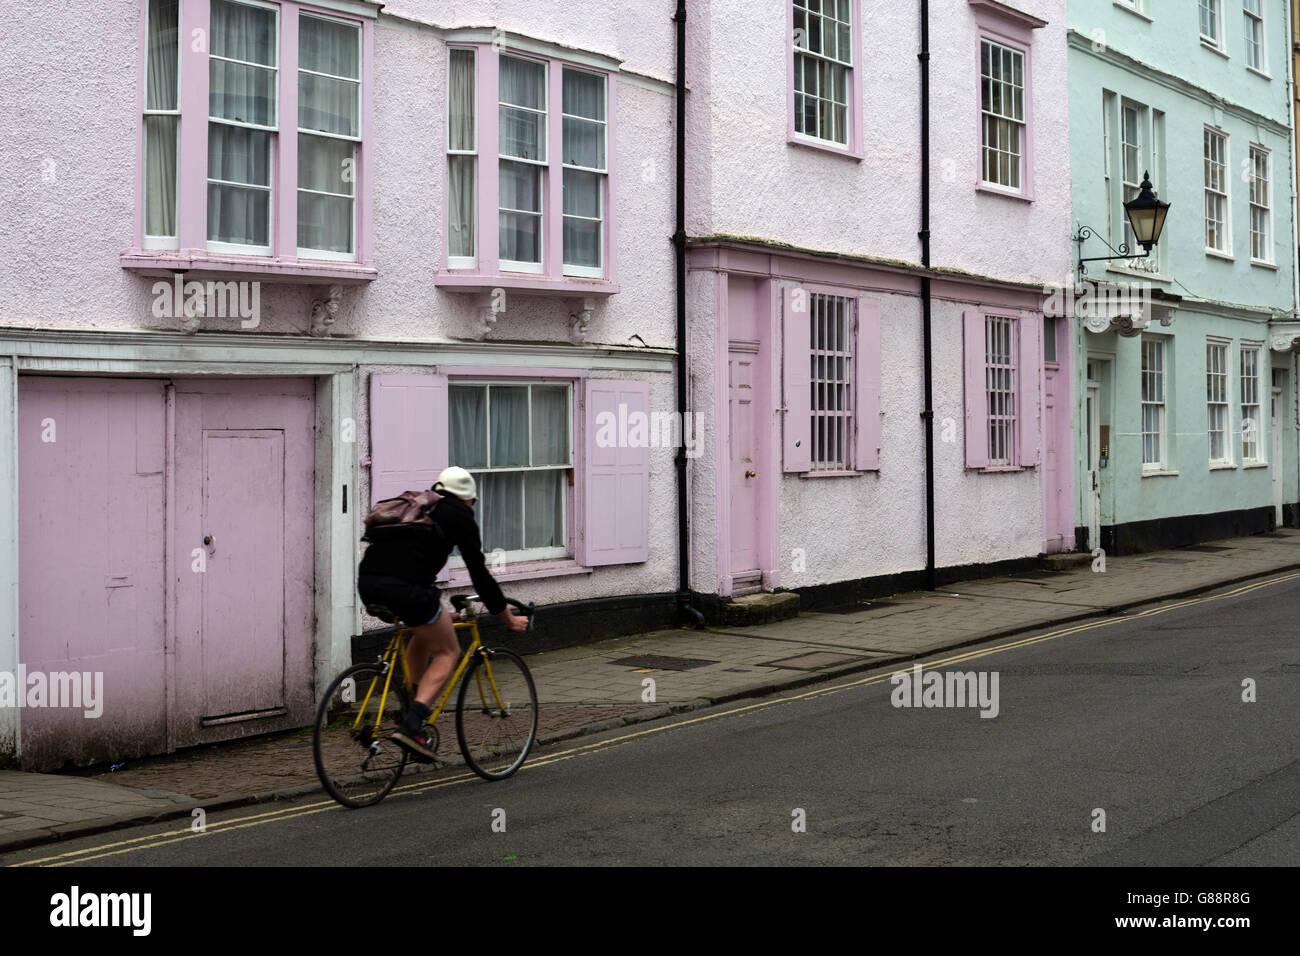 Holywell Street, Oxford, UK - Stock Image